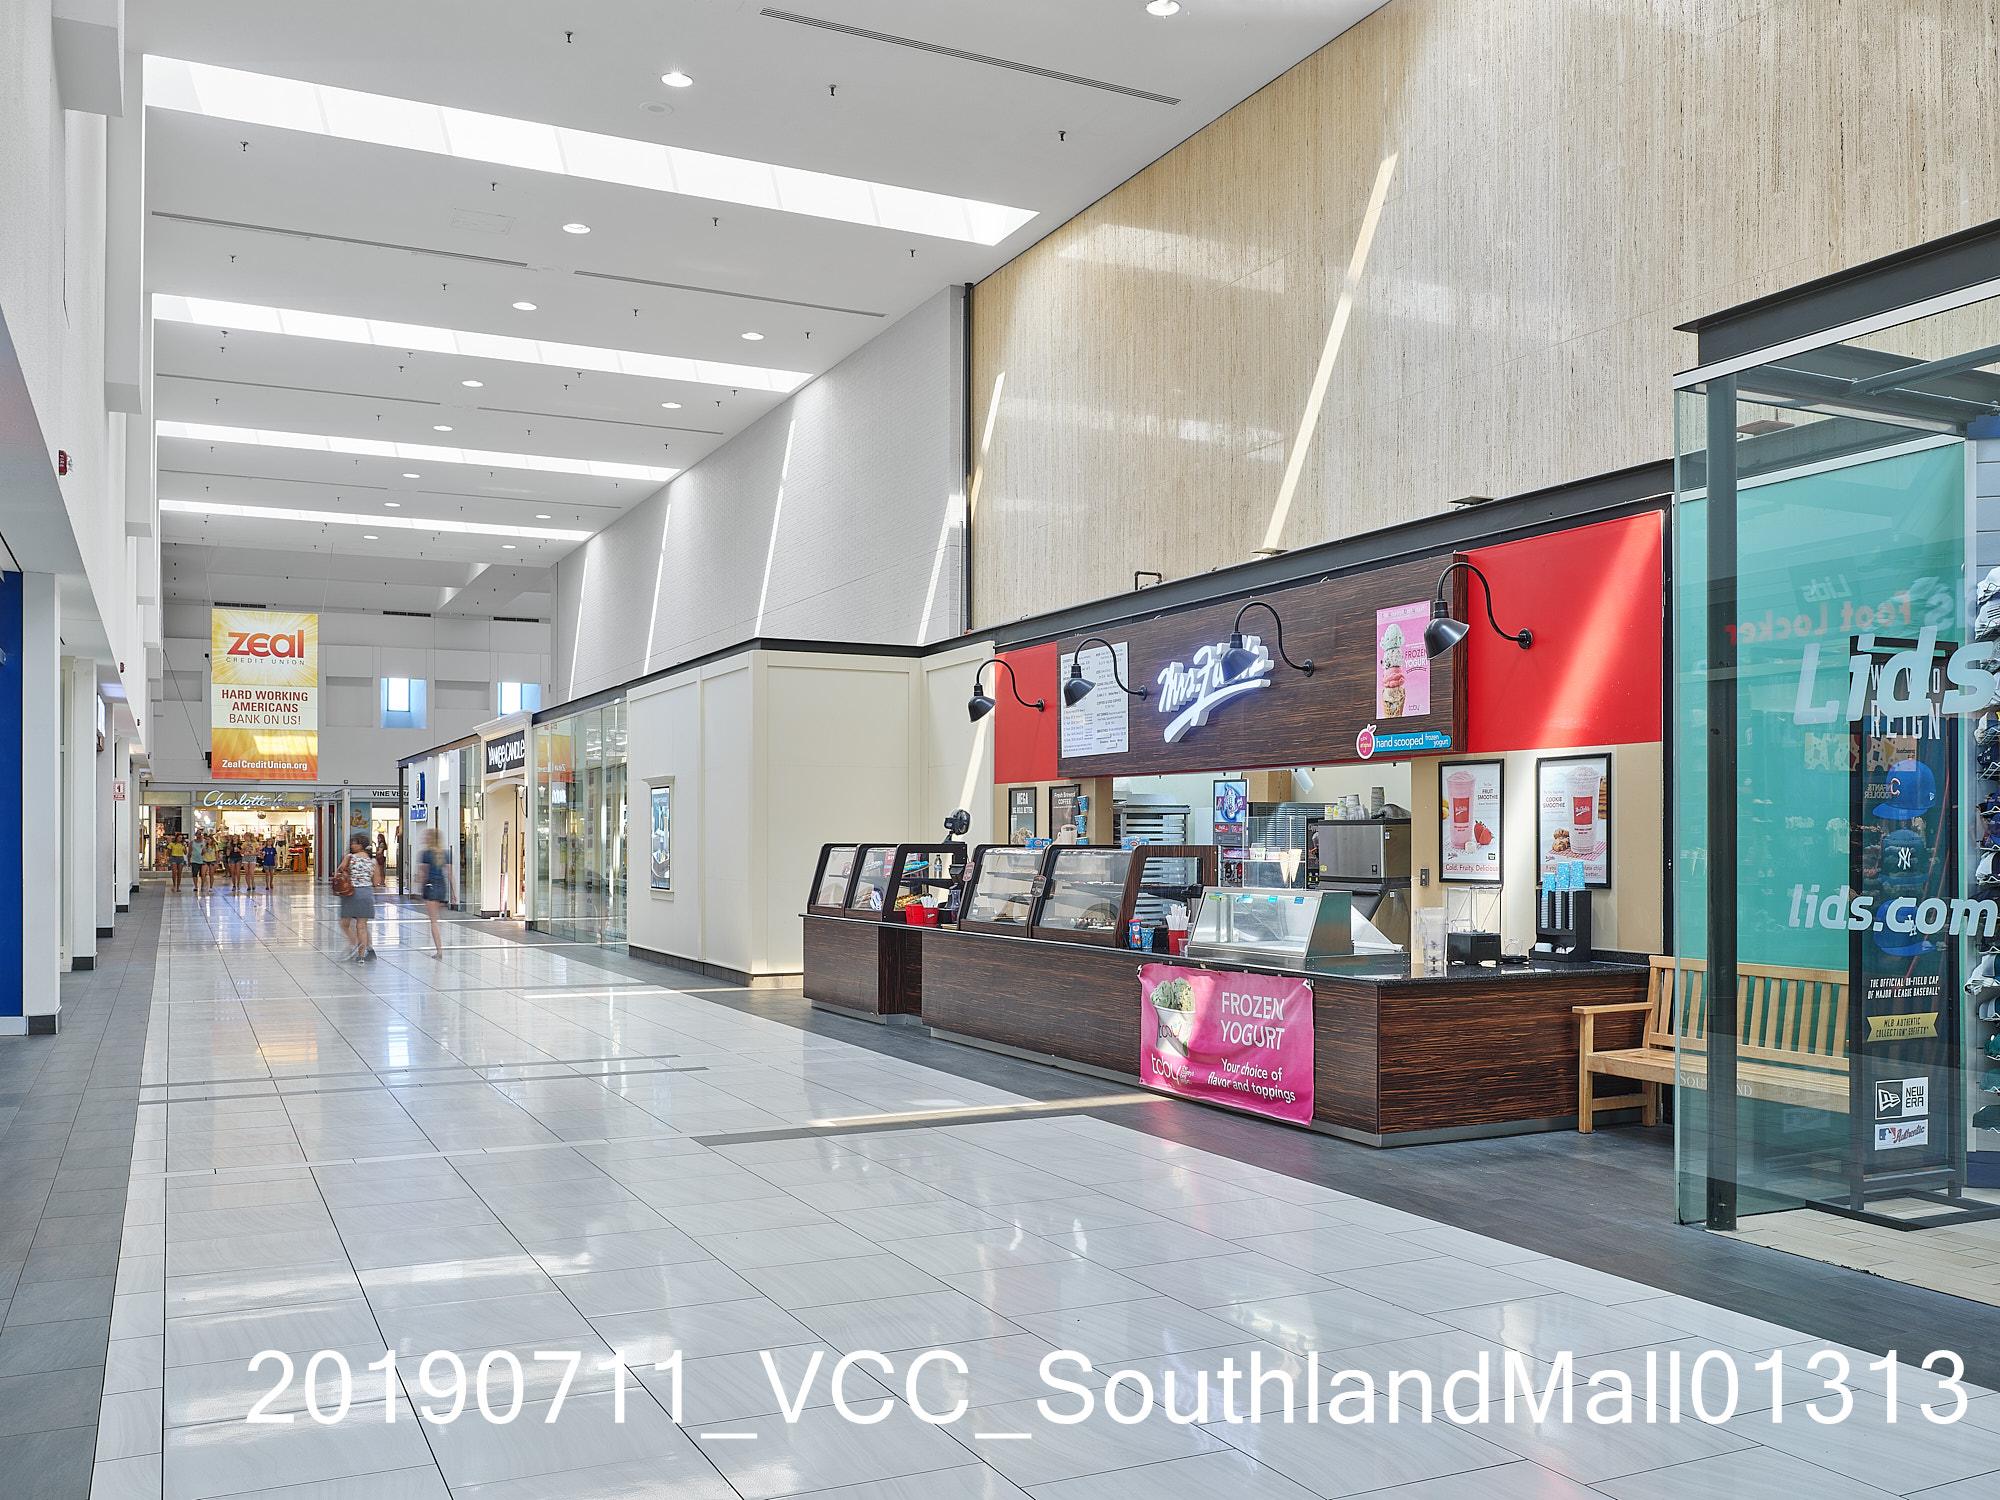 20190711_VCC_SouthlandMall01313.jpg